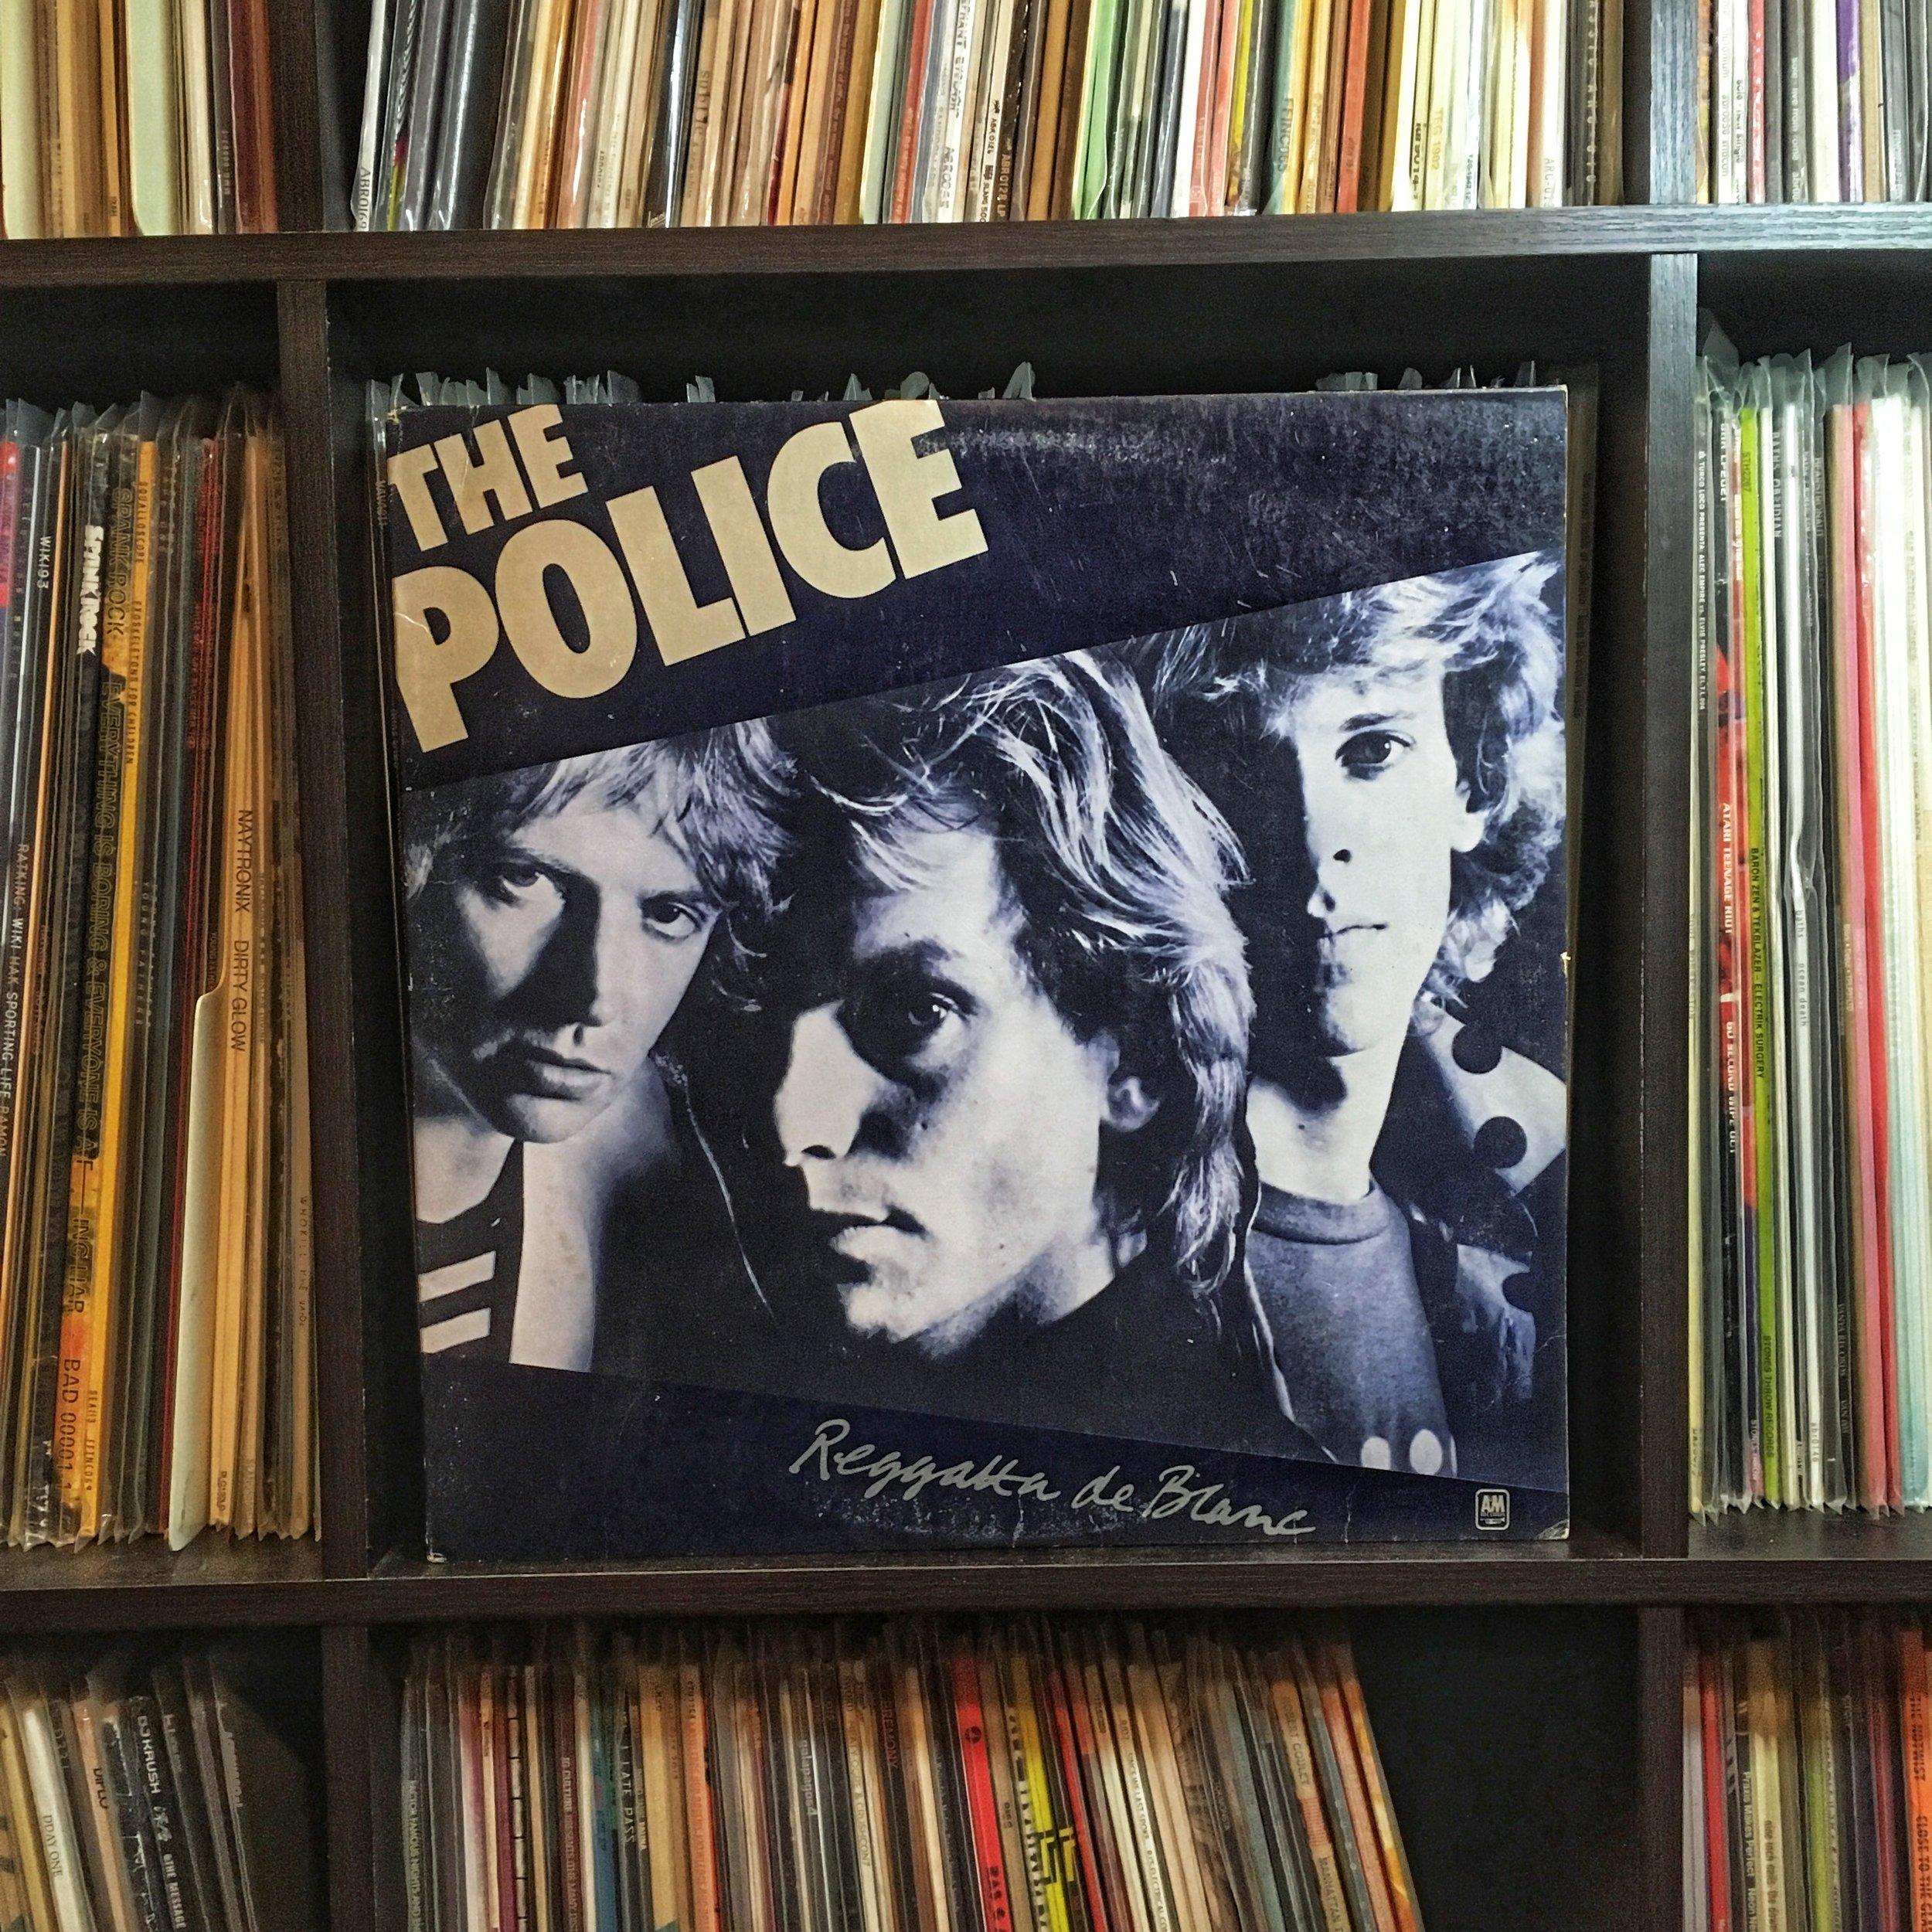 3 the police.JPEG